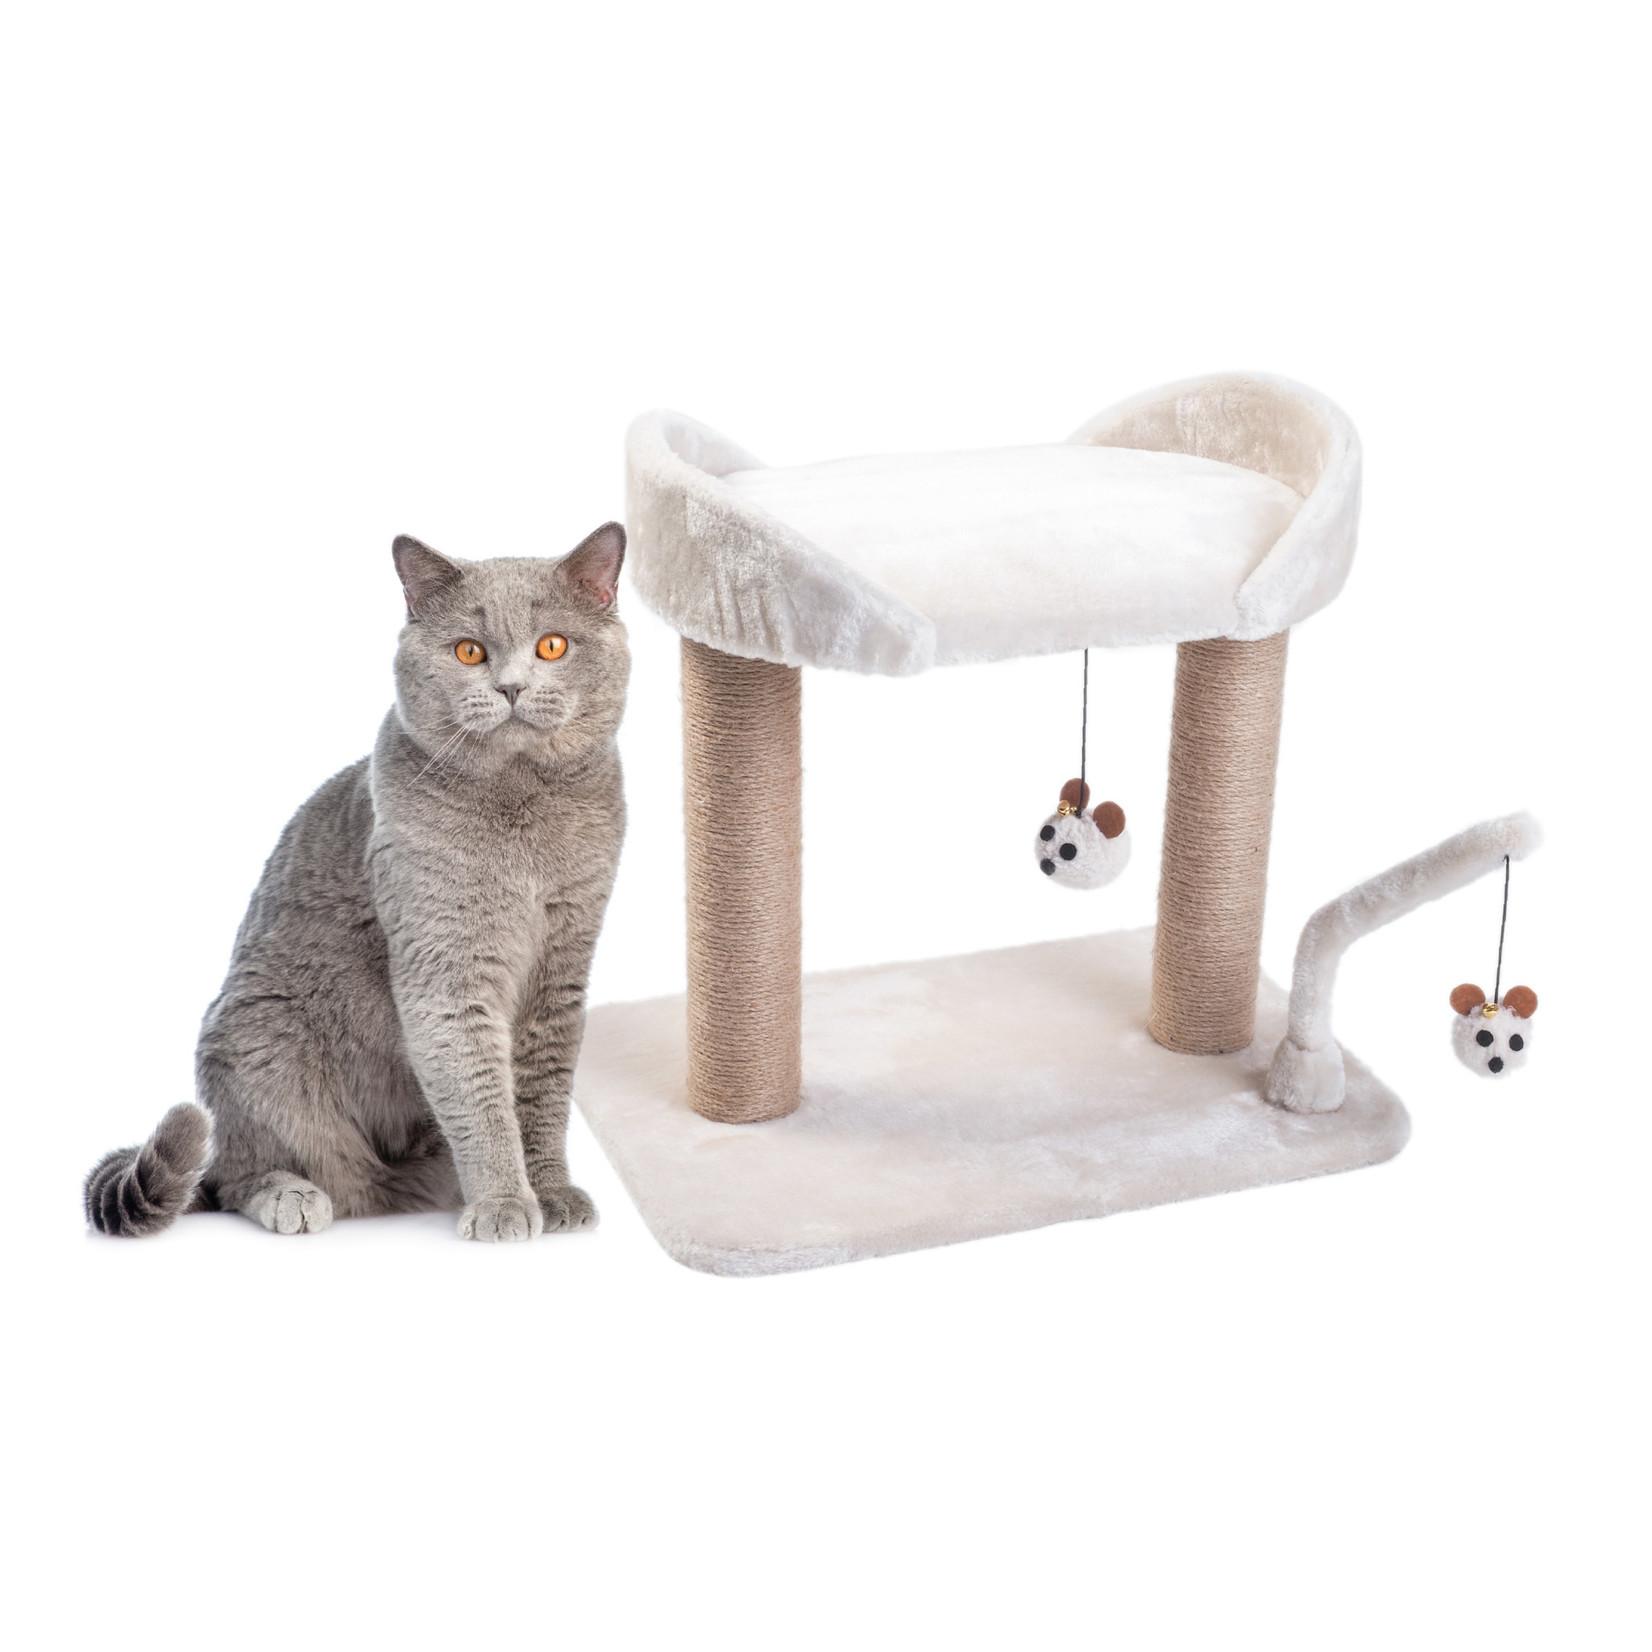 Zöon Deluxe Dual-Deck Cat Scratching Post, 1m